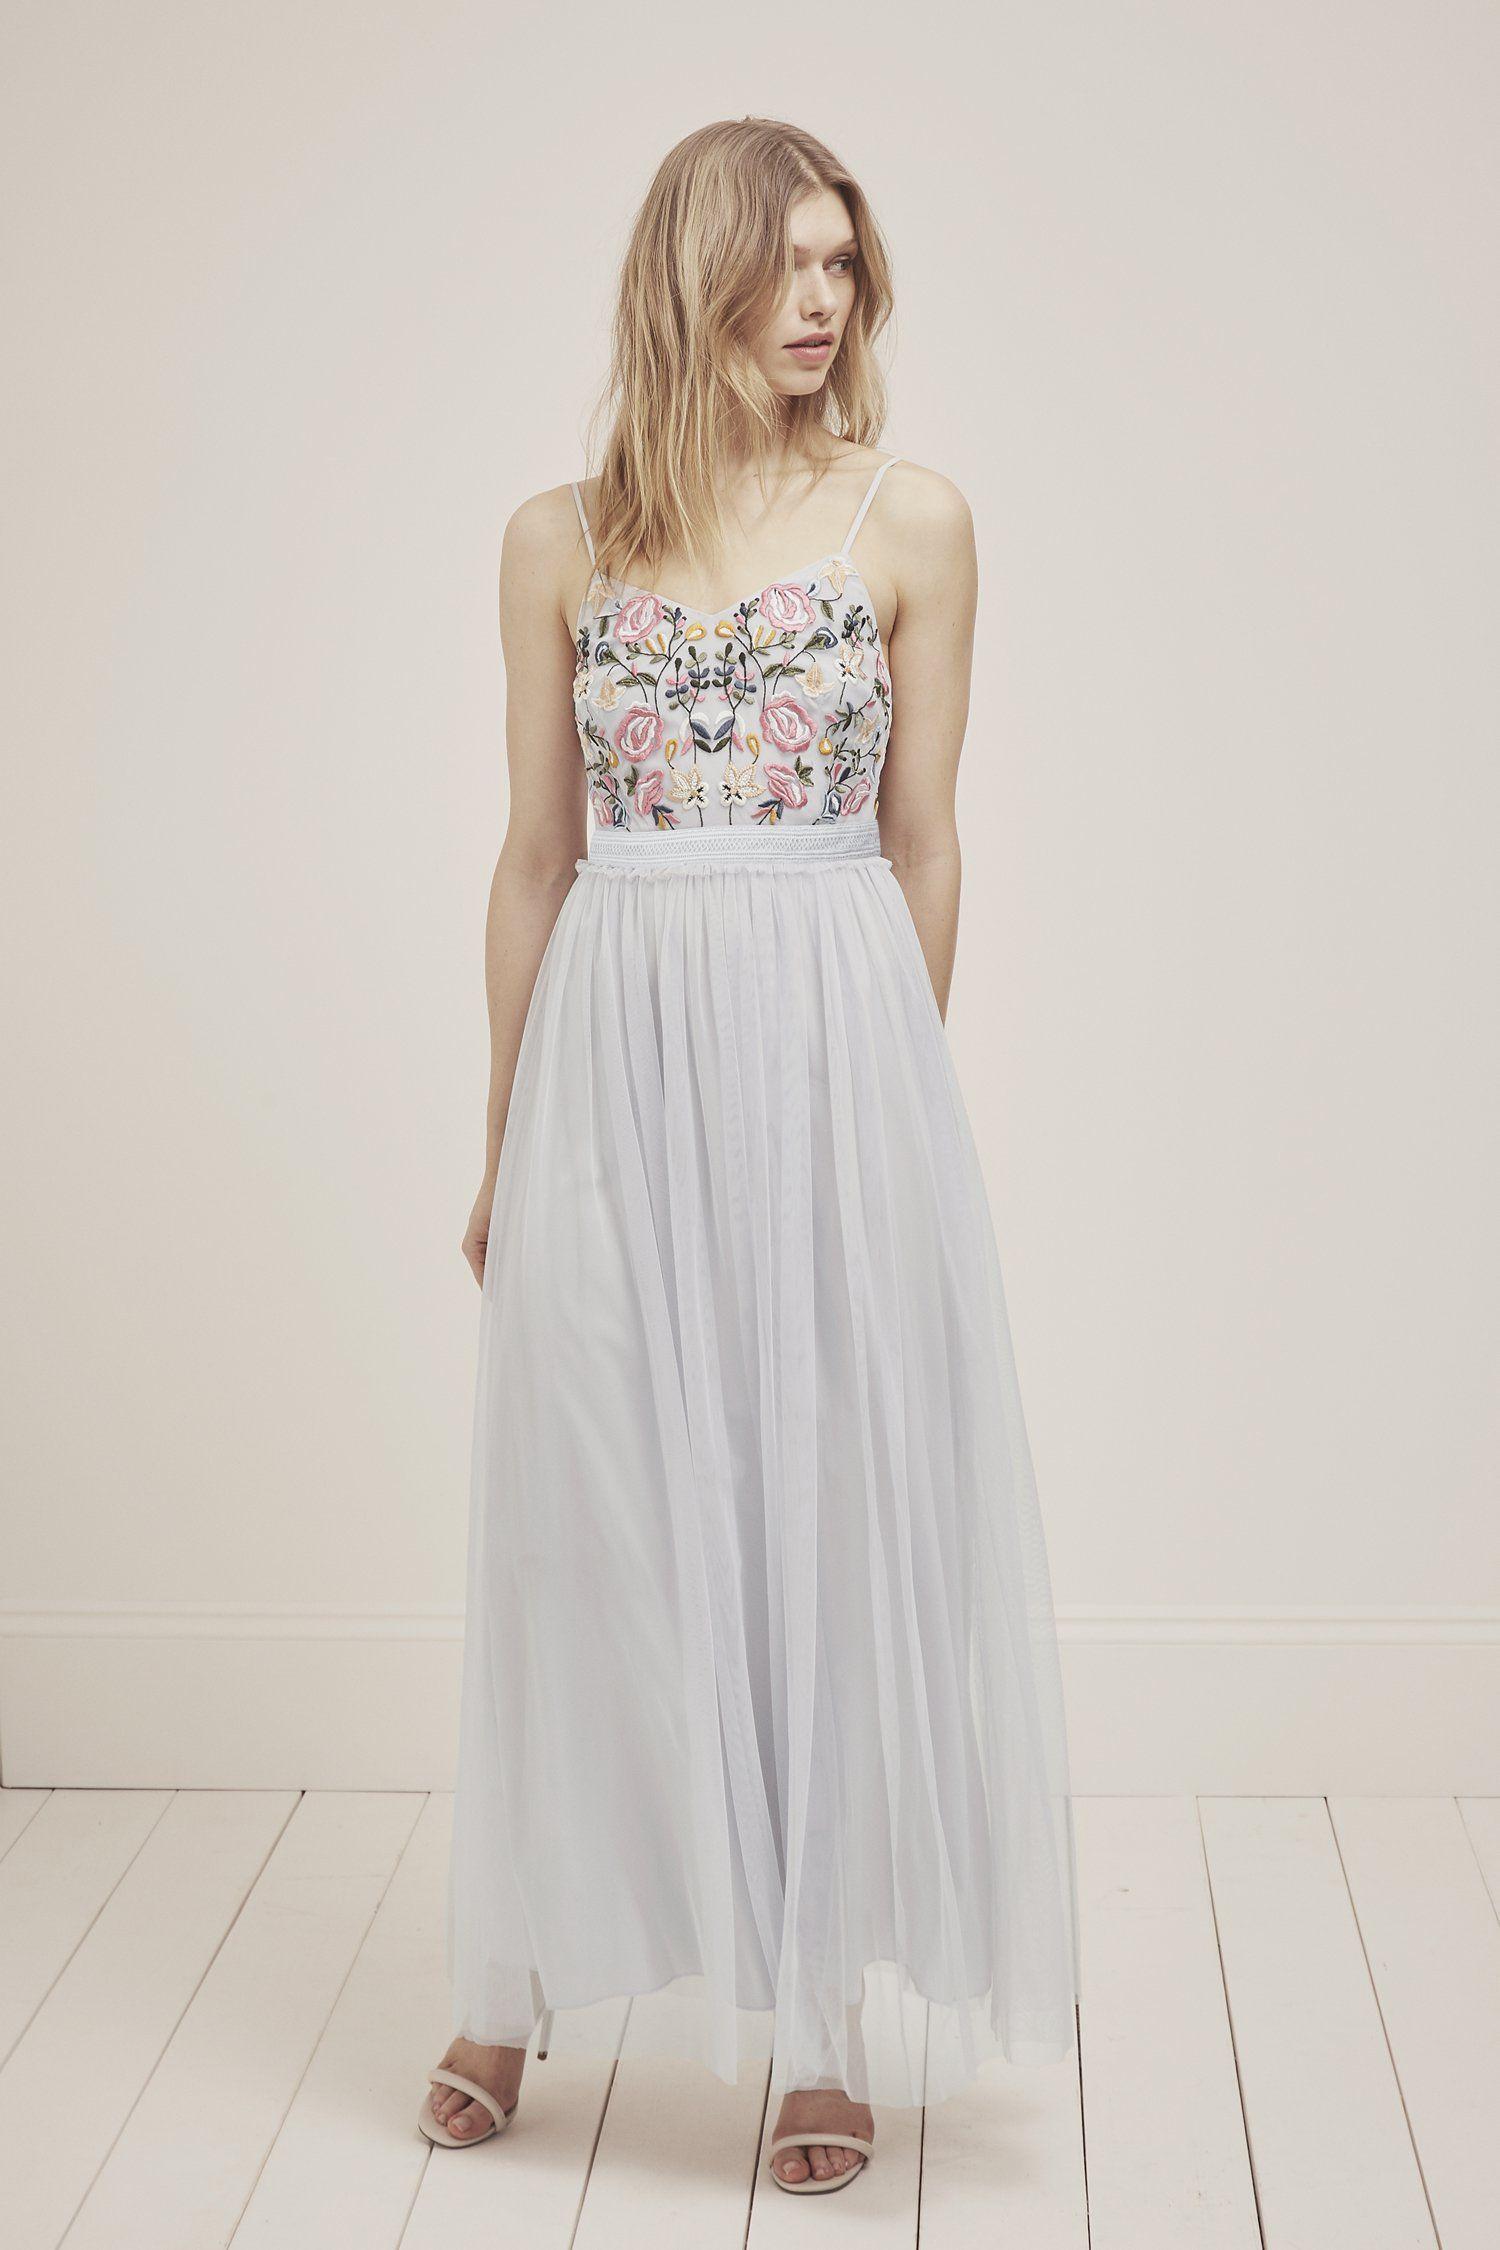 Embroidered maxi dress Fabric lightweight, lofty, layered